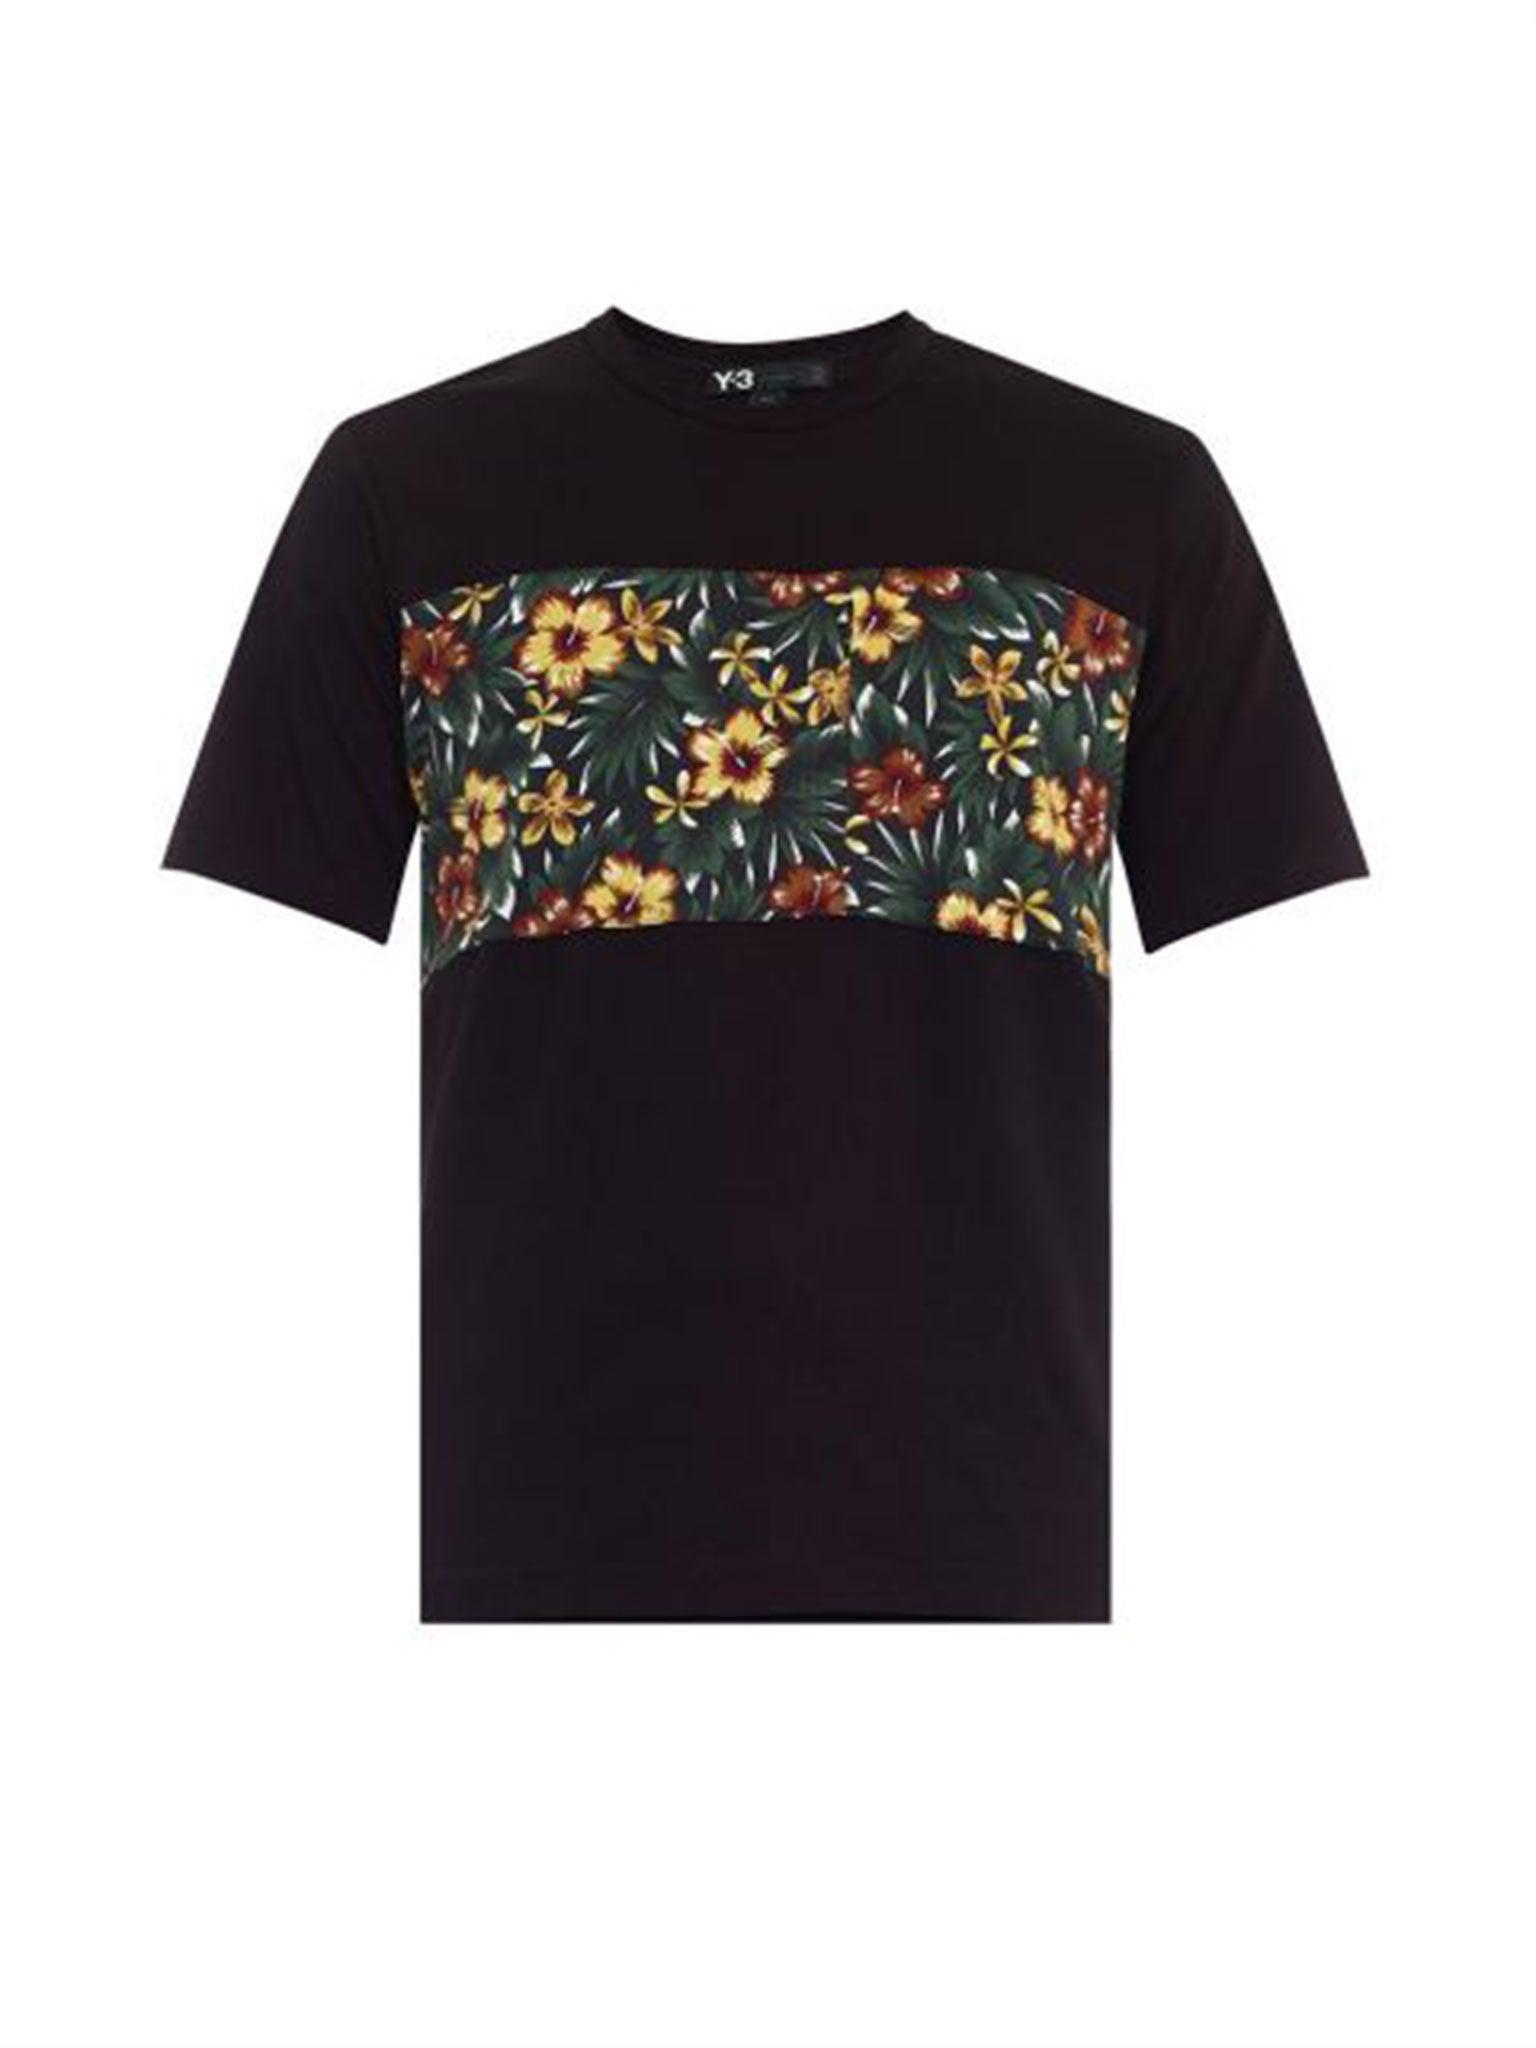 97d5e5face92 12 best men's T-shirts | The Independent